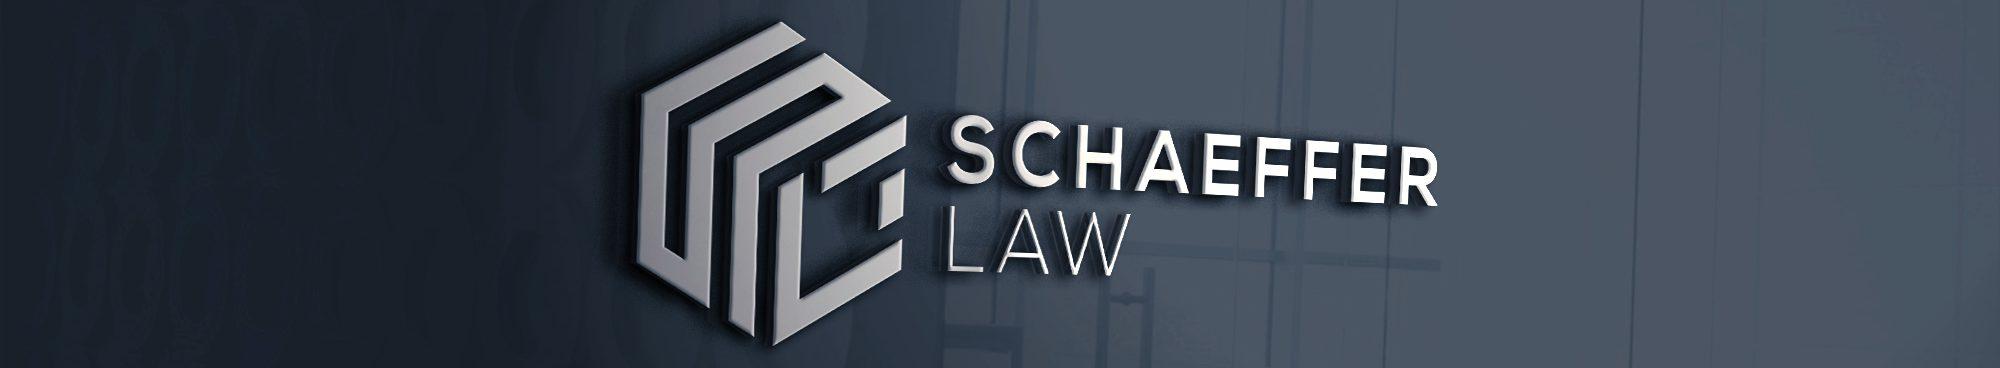 Schaeffer Law